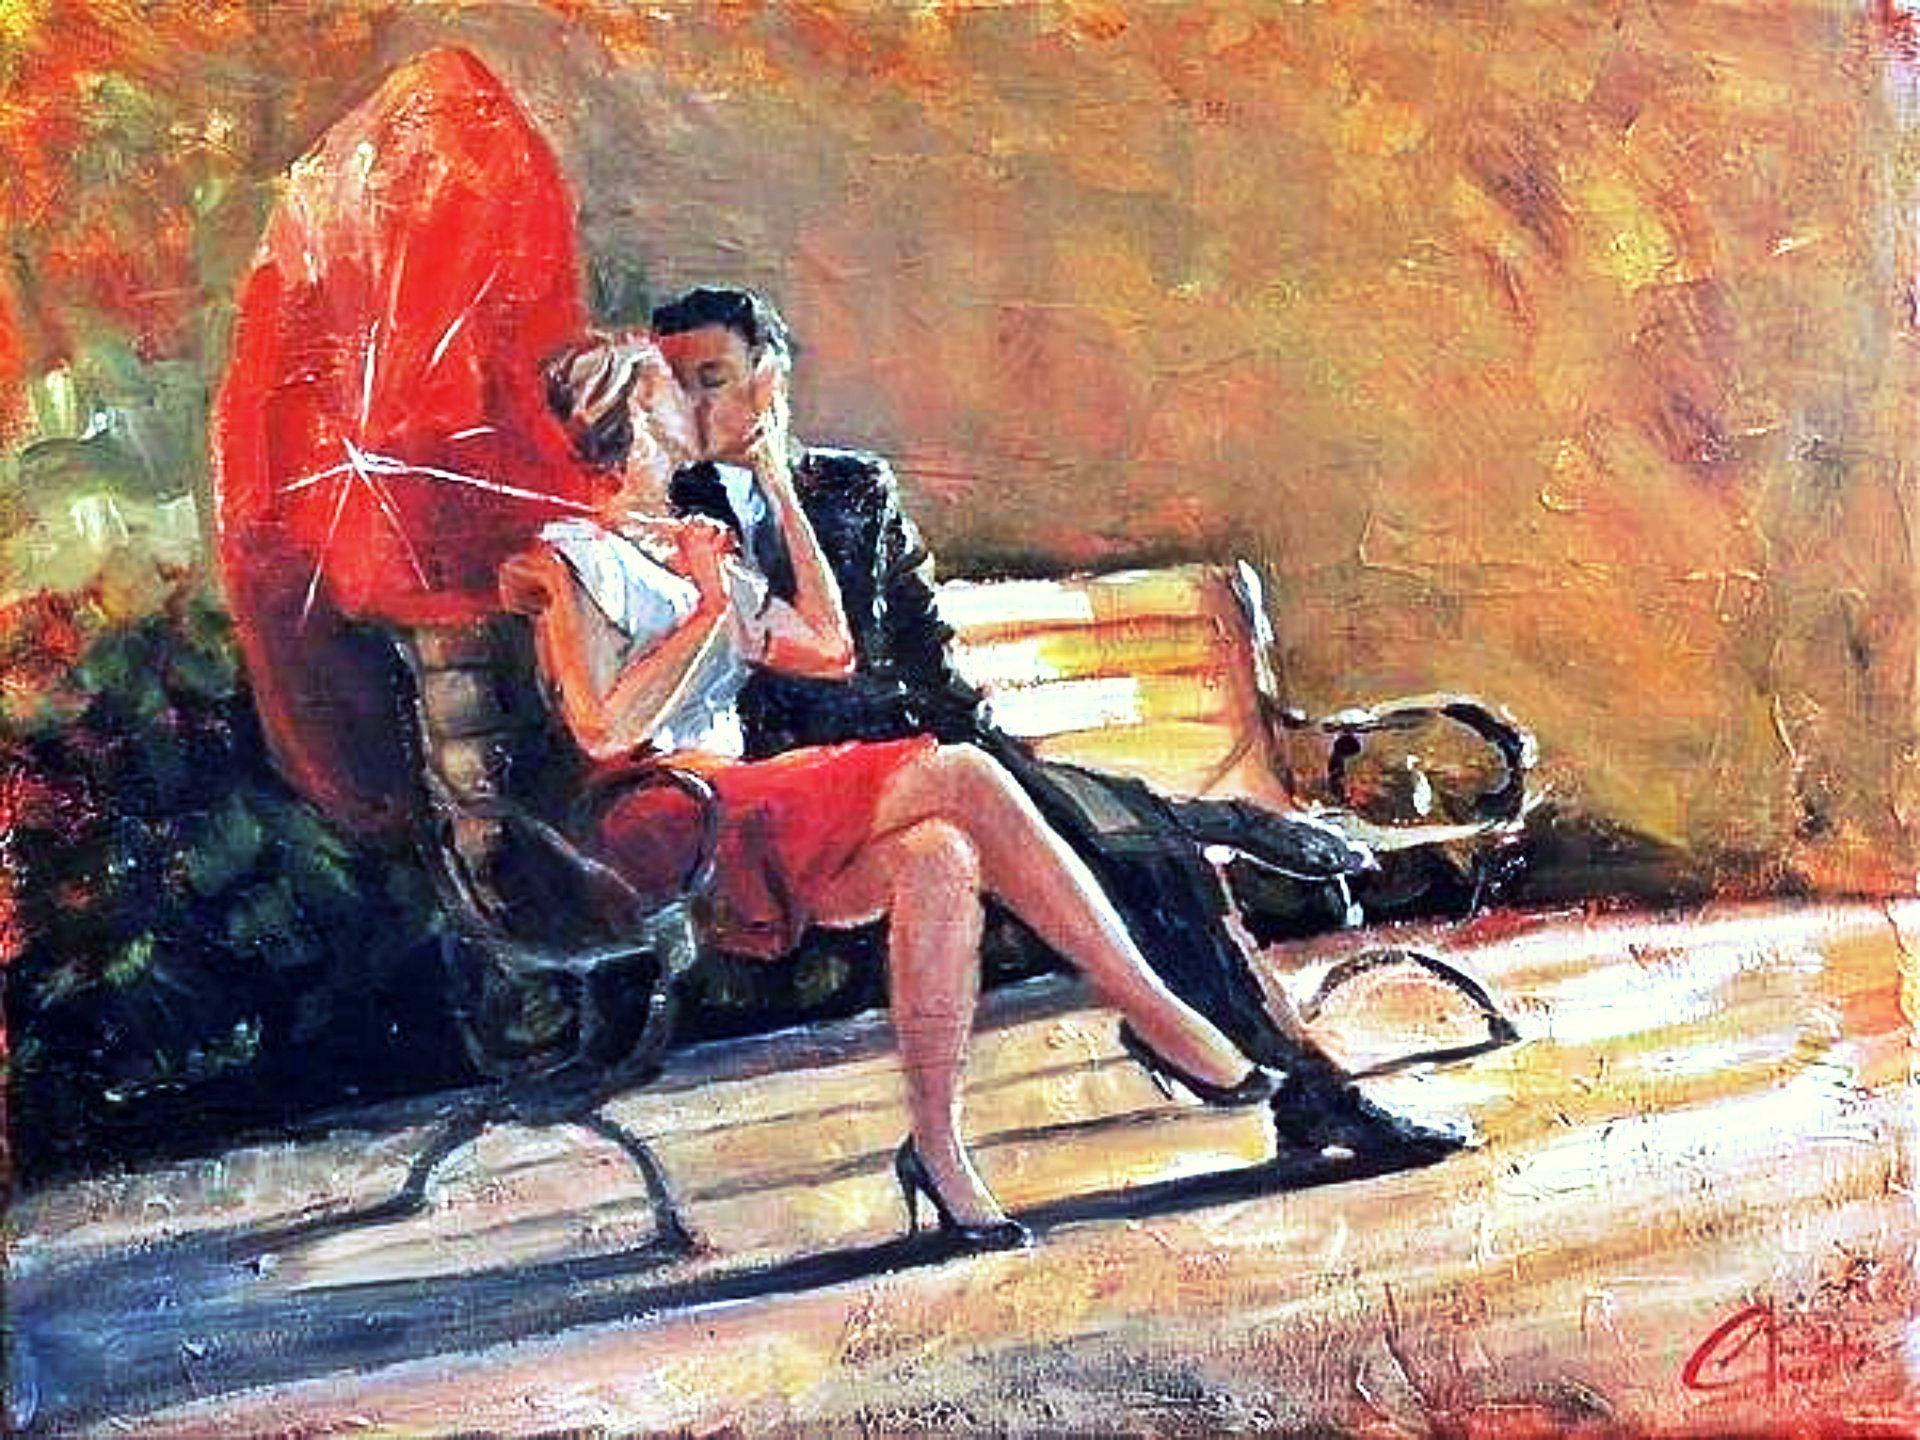 painting_autumn_kiss_love_umberalla_art_hd-wallpaper-1799088